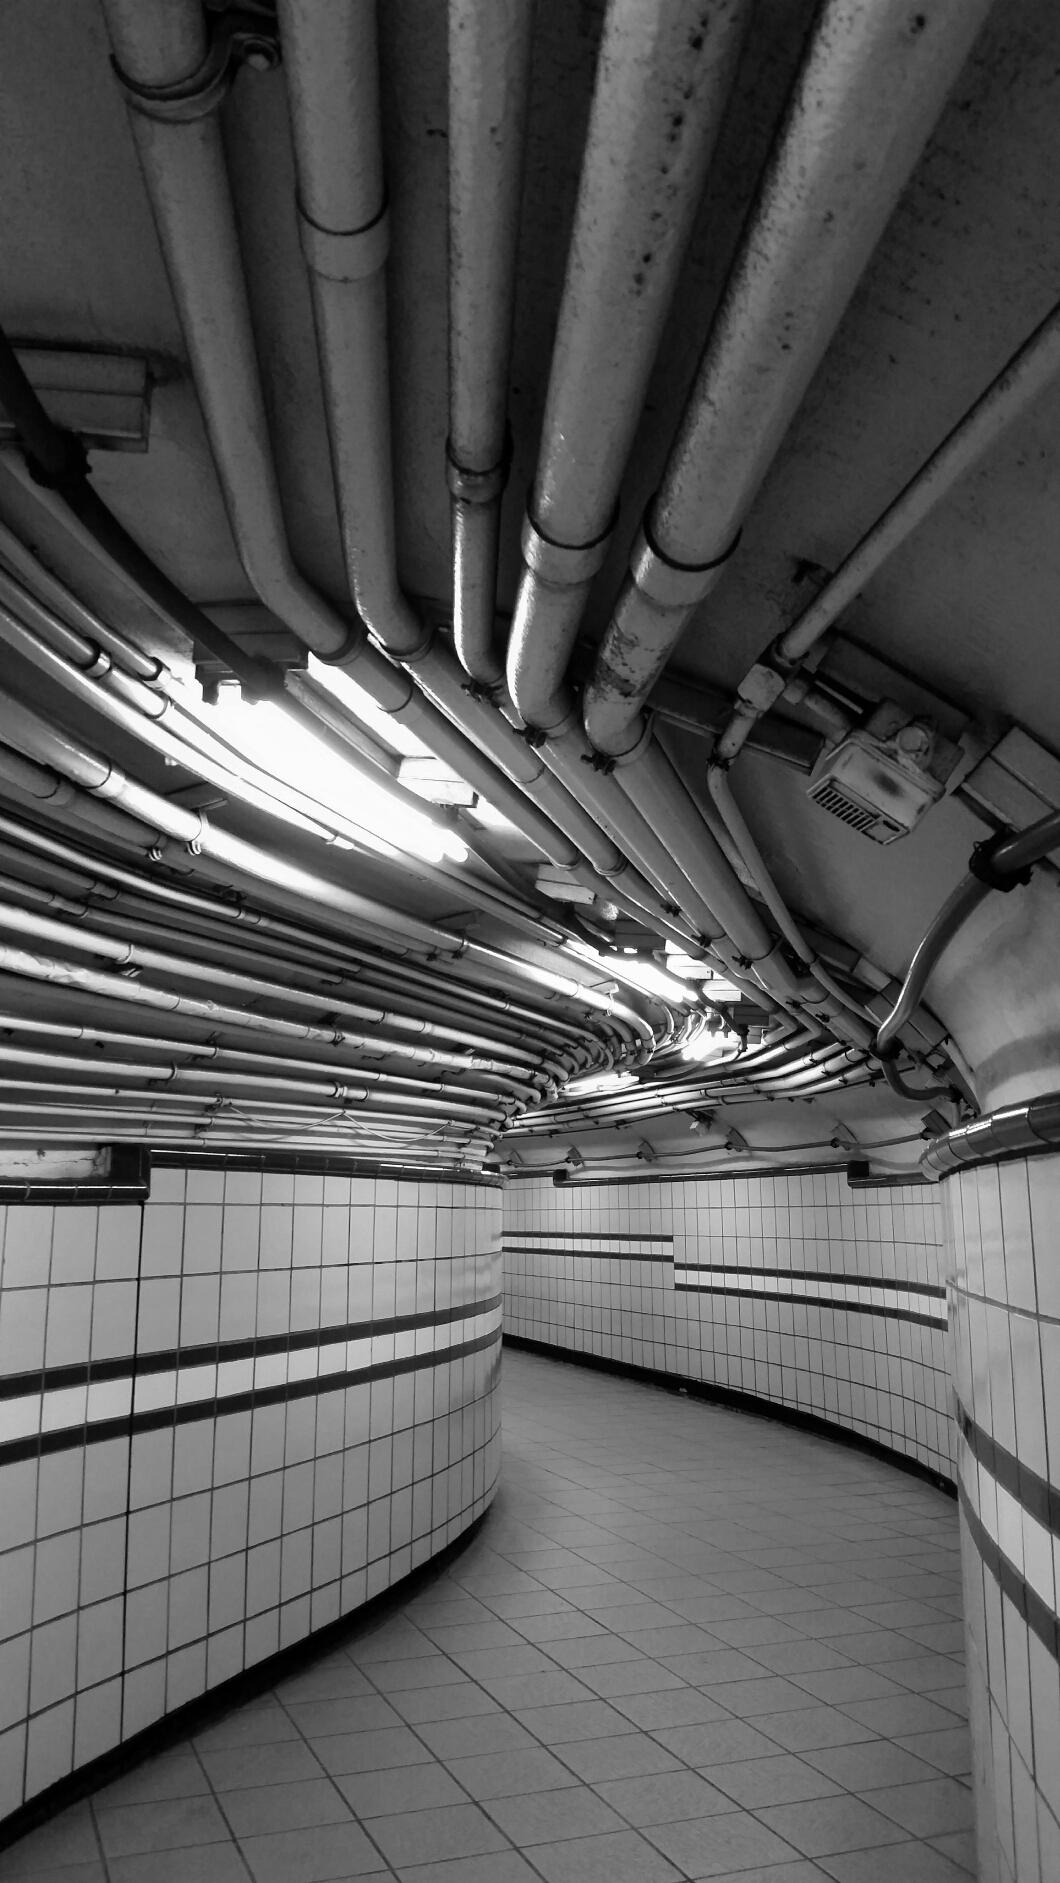 Subway hallway NYC monochrome